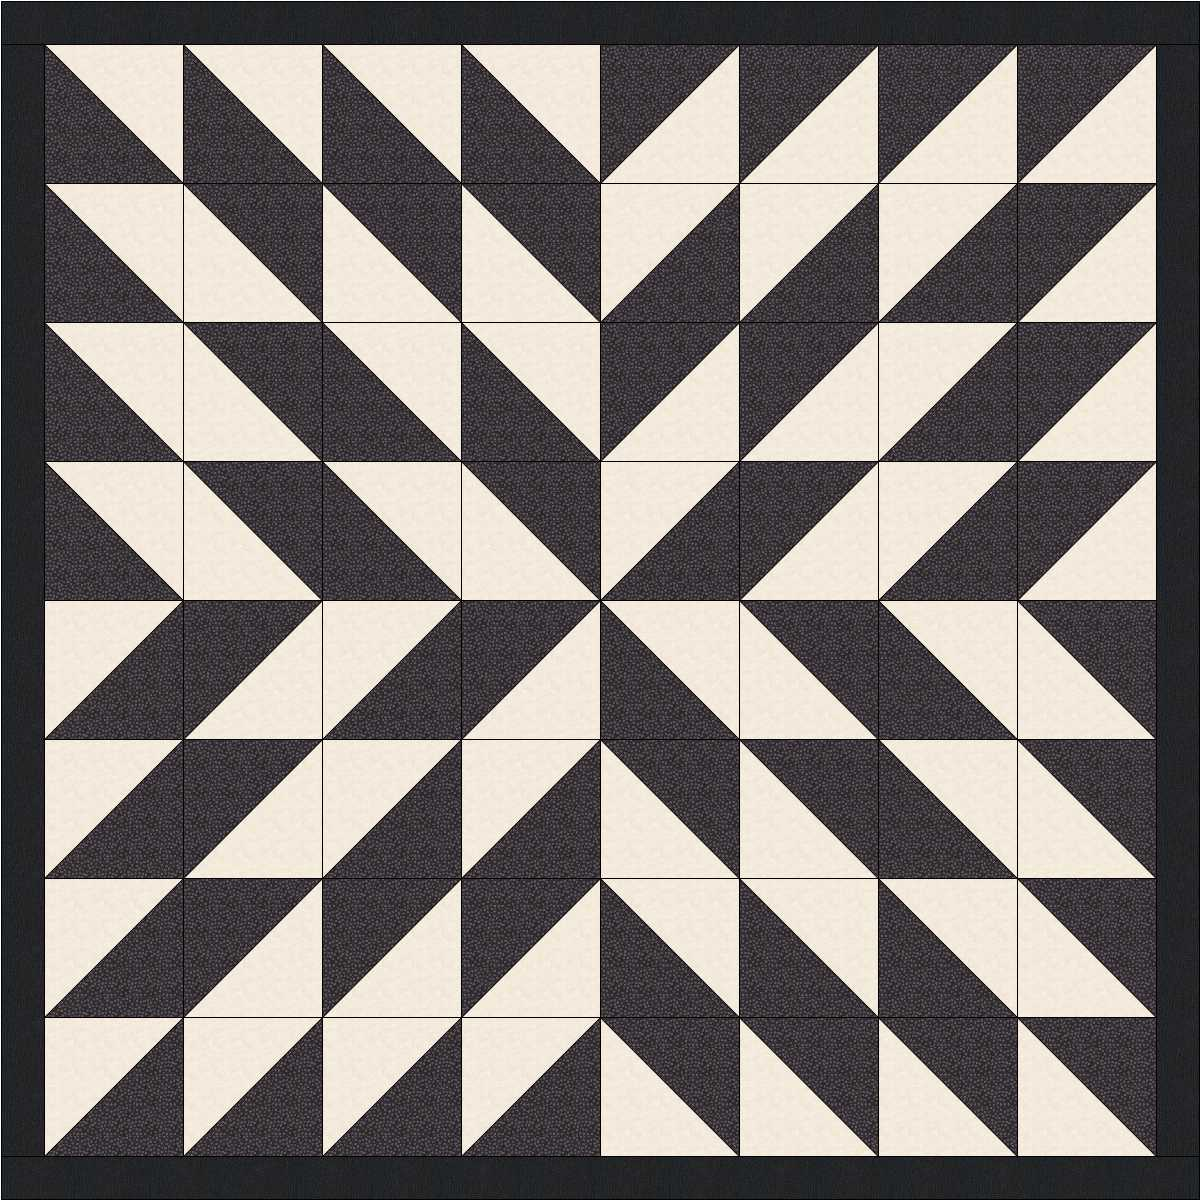 graphic design patterns - monochromatic patterns